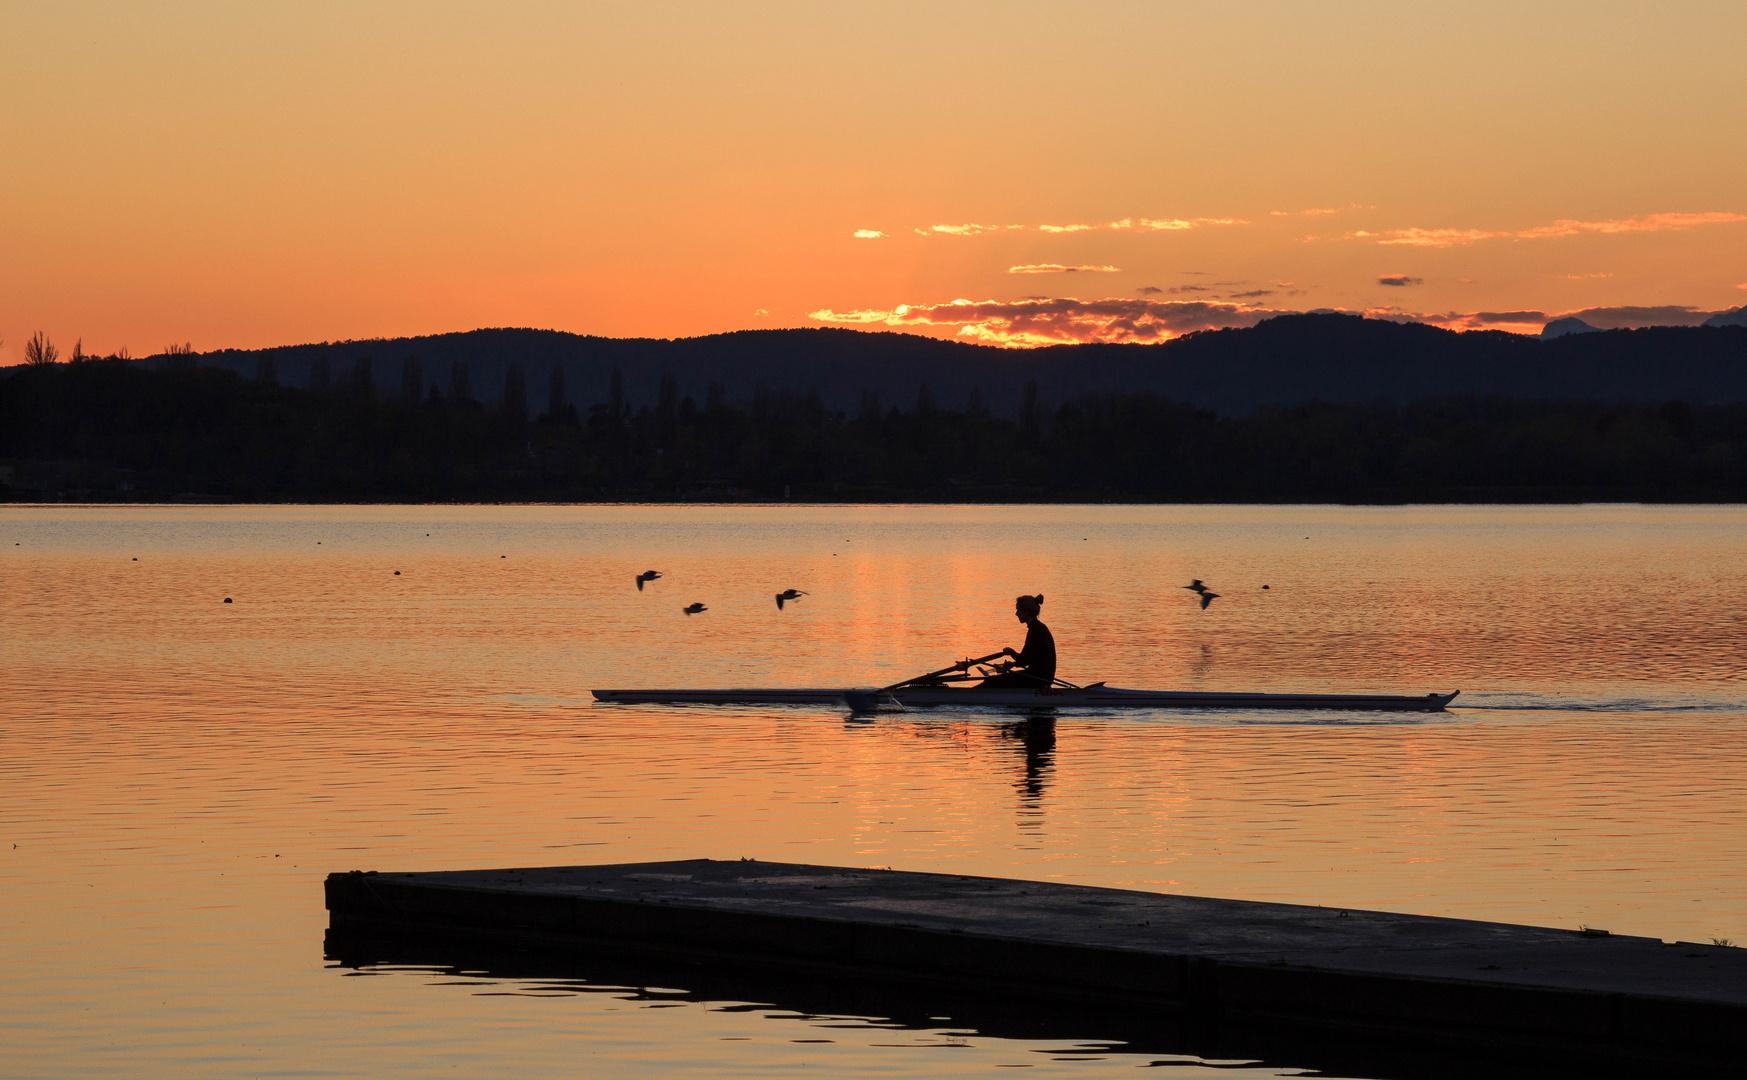 Lake travelers